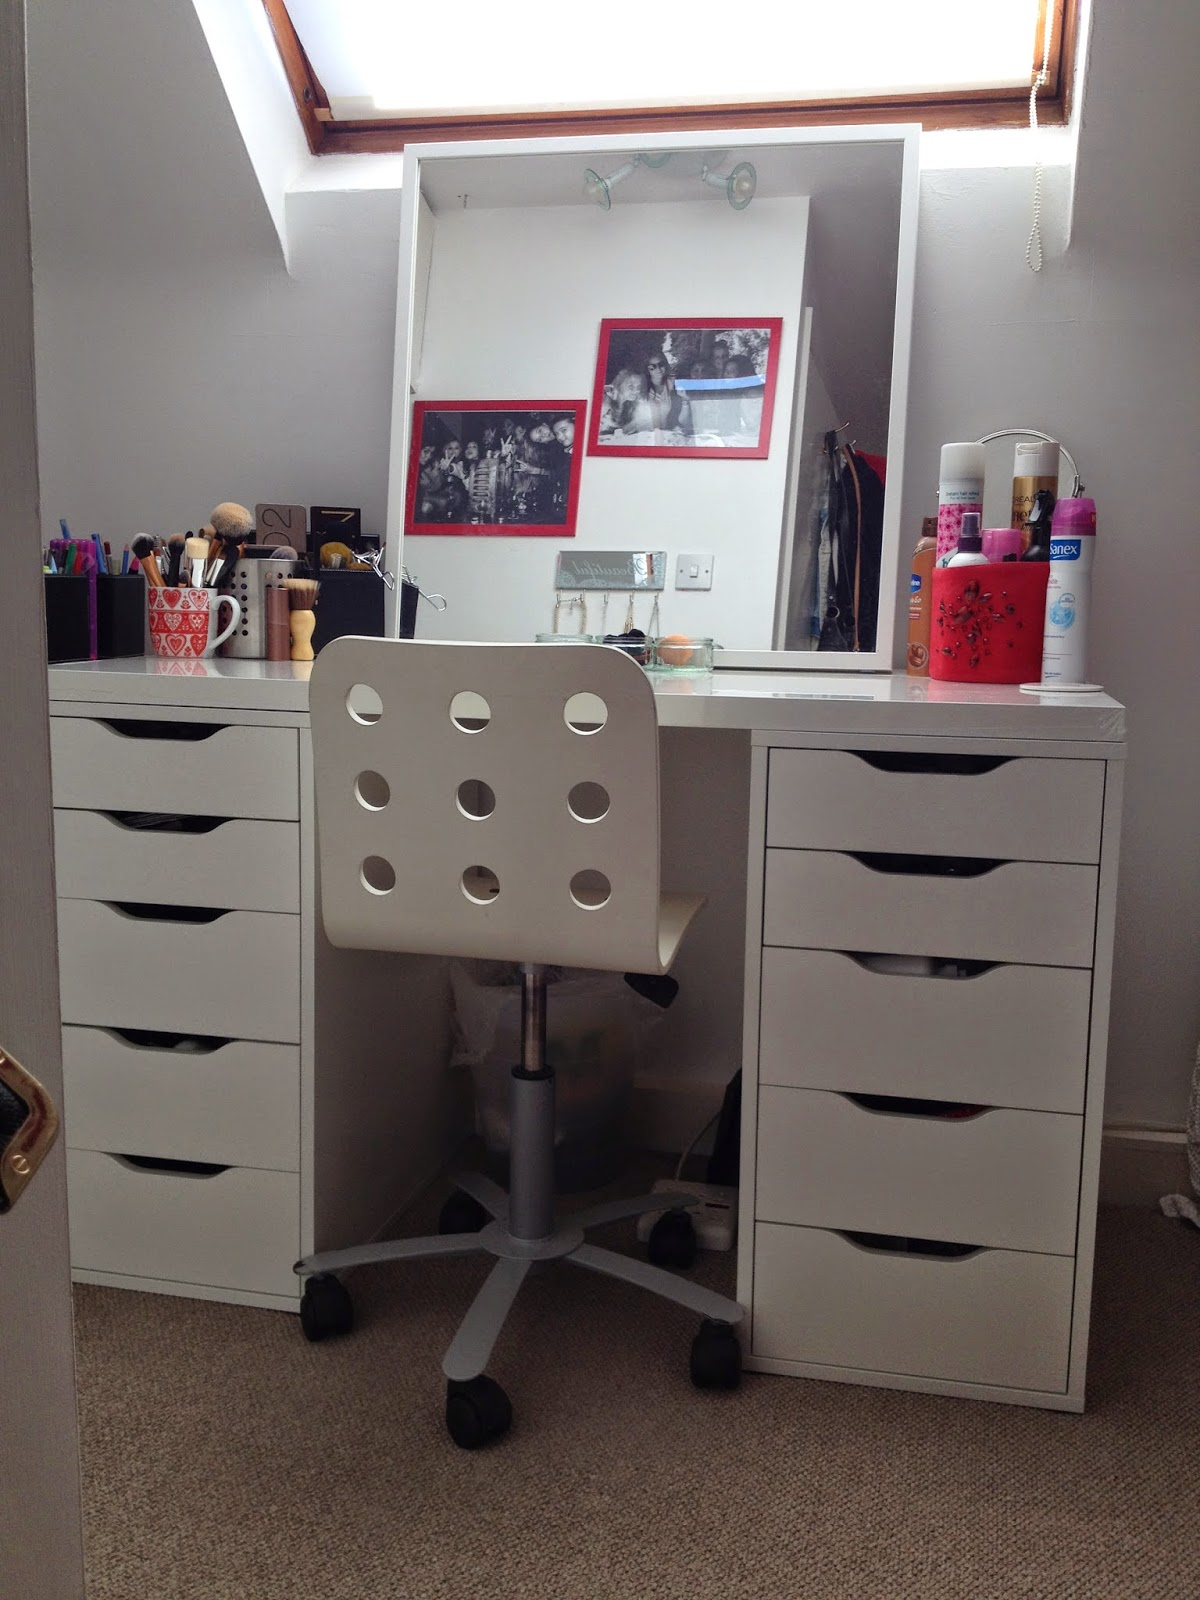 My Makeup Storage And Organisation